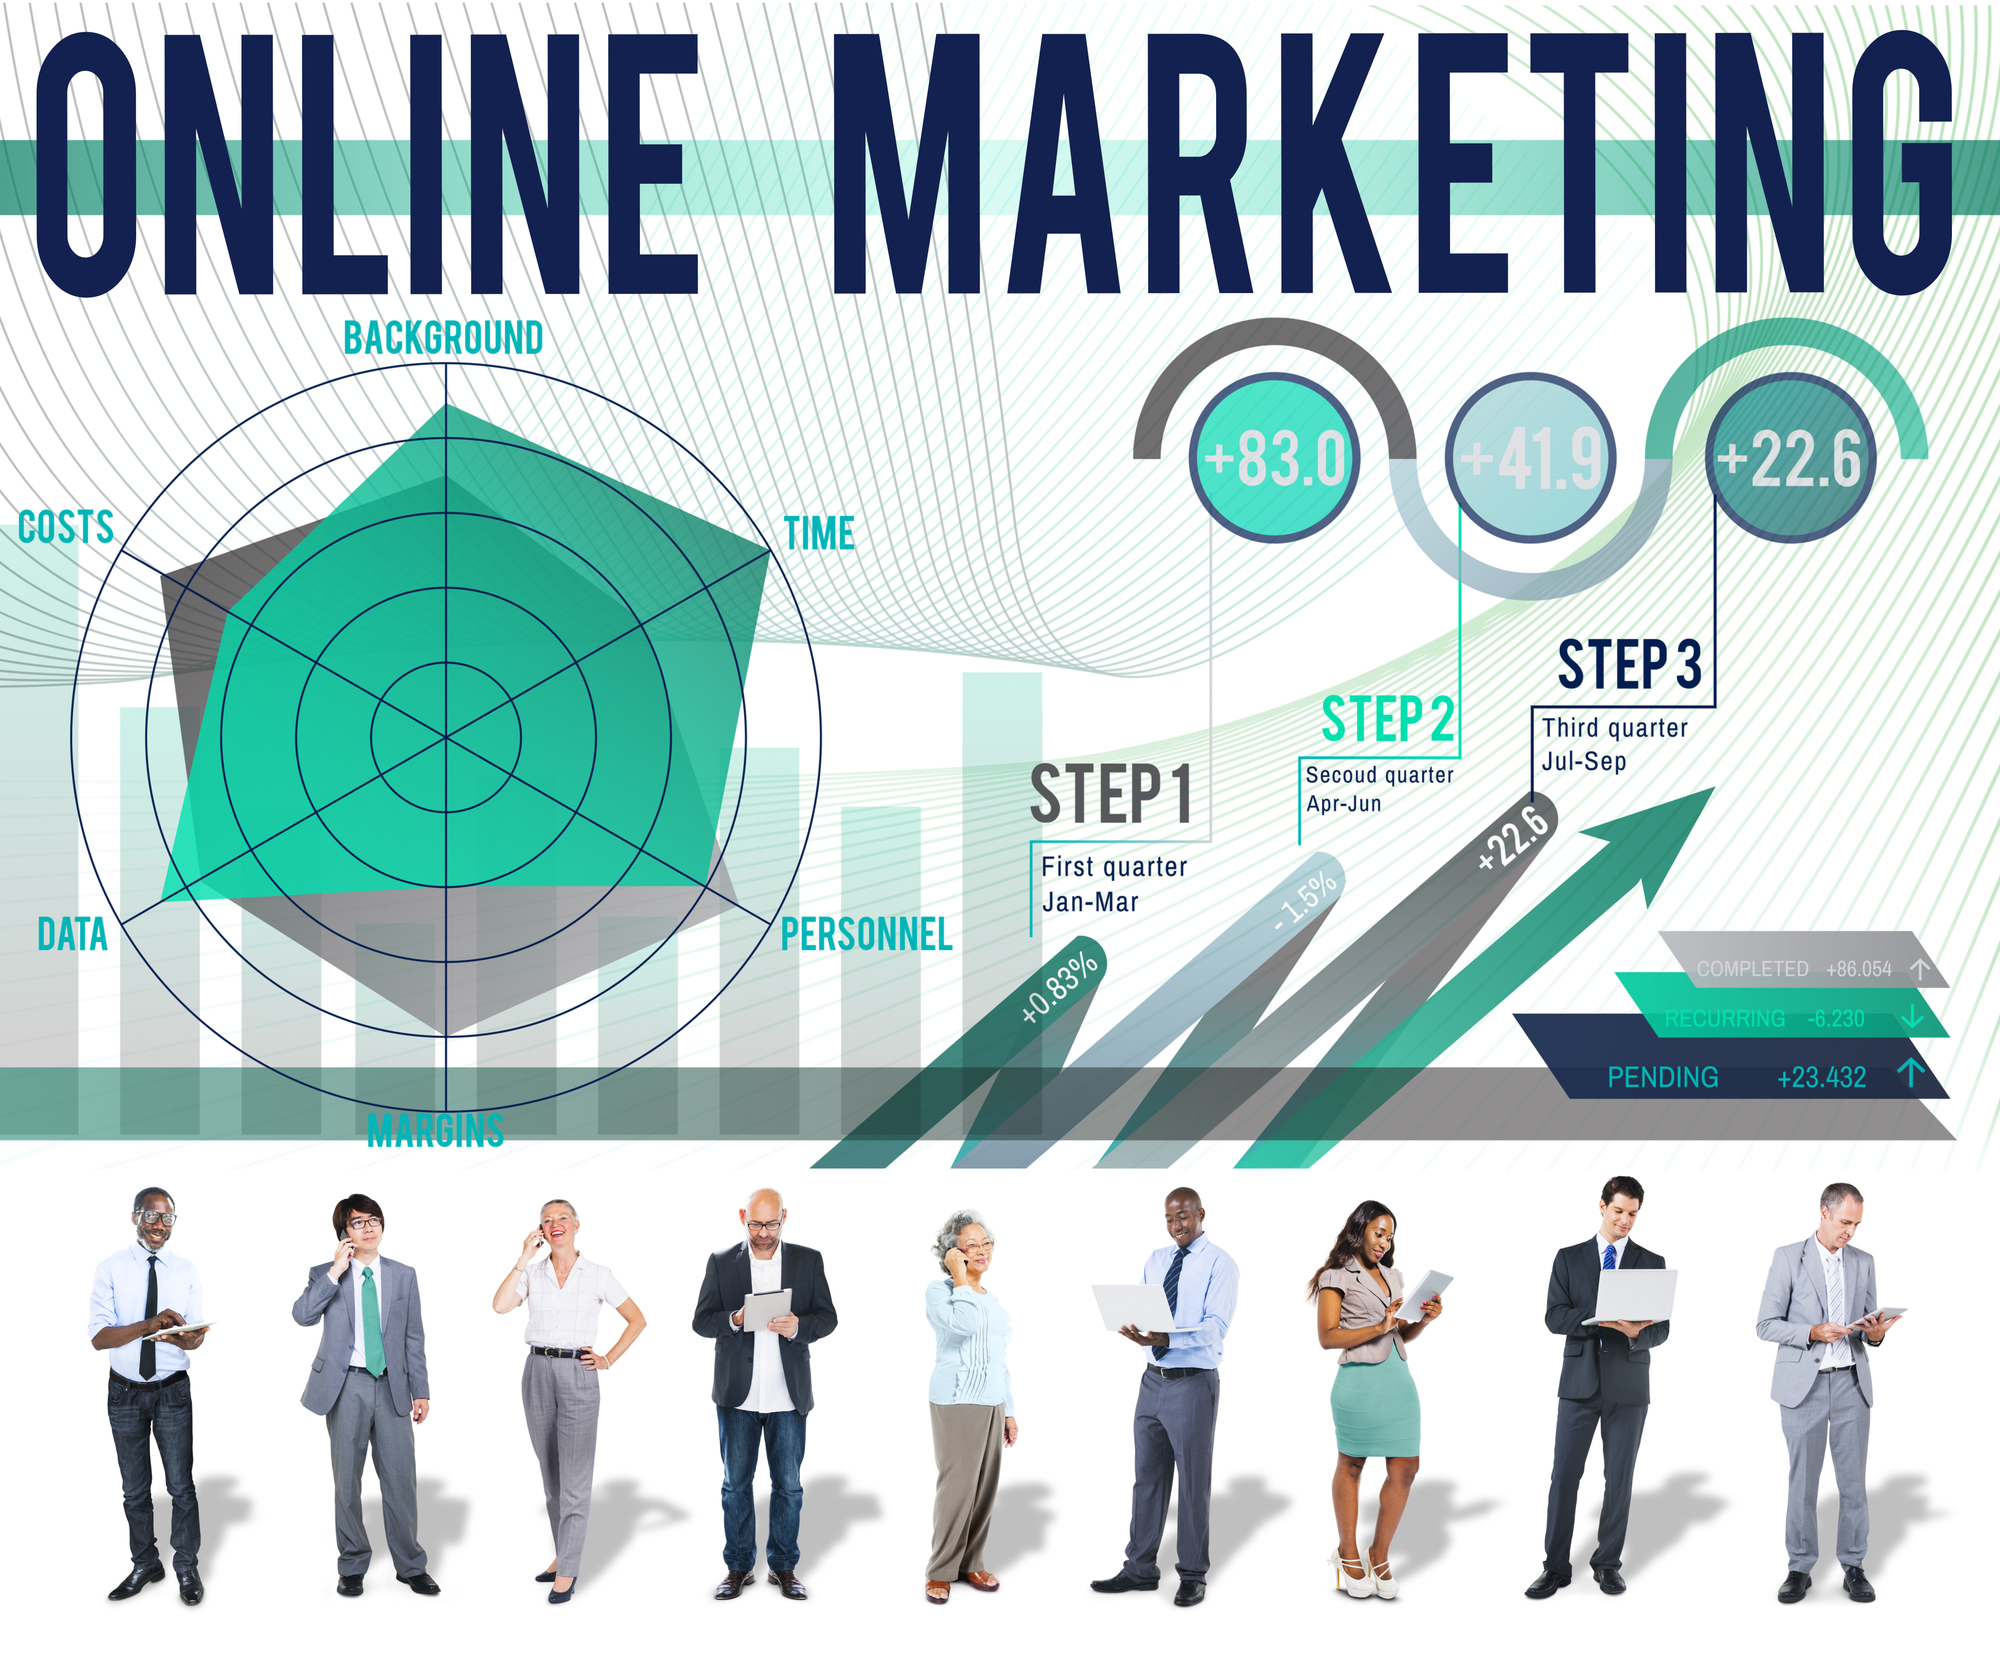 Webマーケティング会社がお勧めできるWebマーケティング企業5選➕1